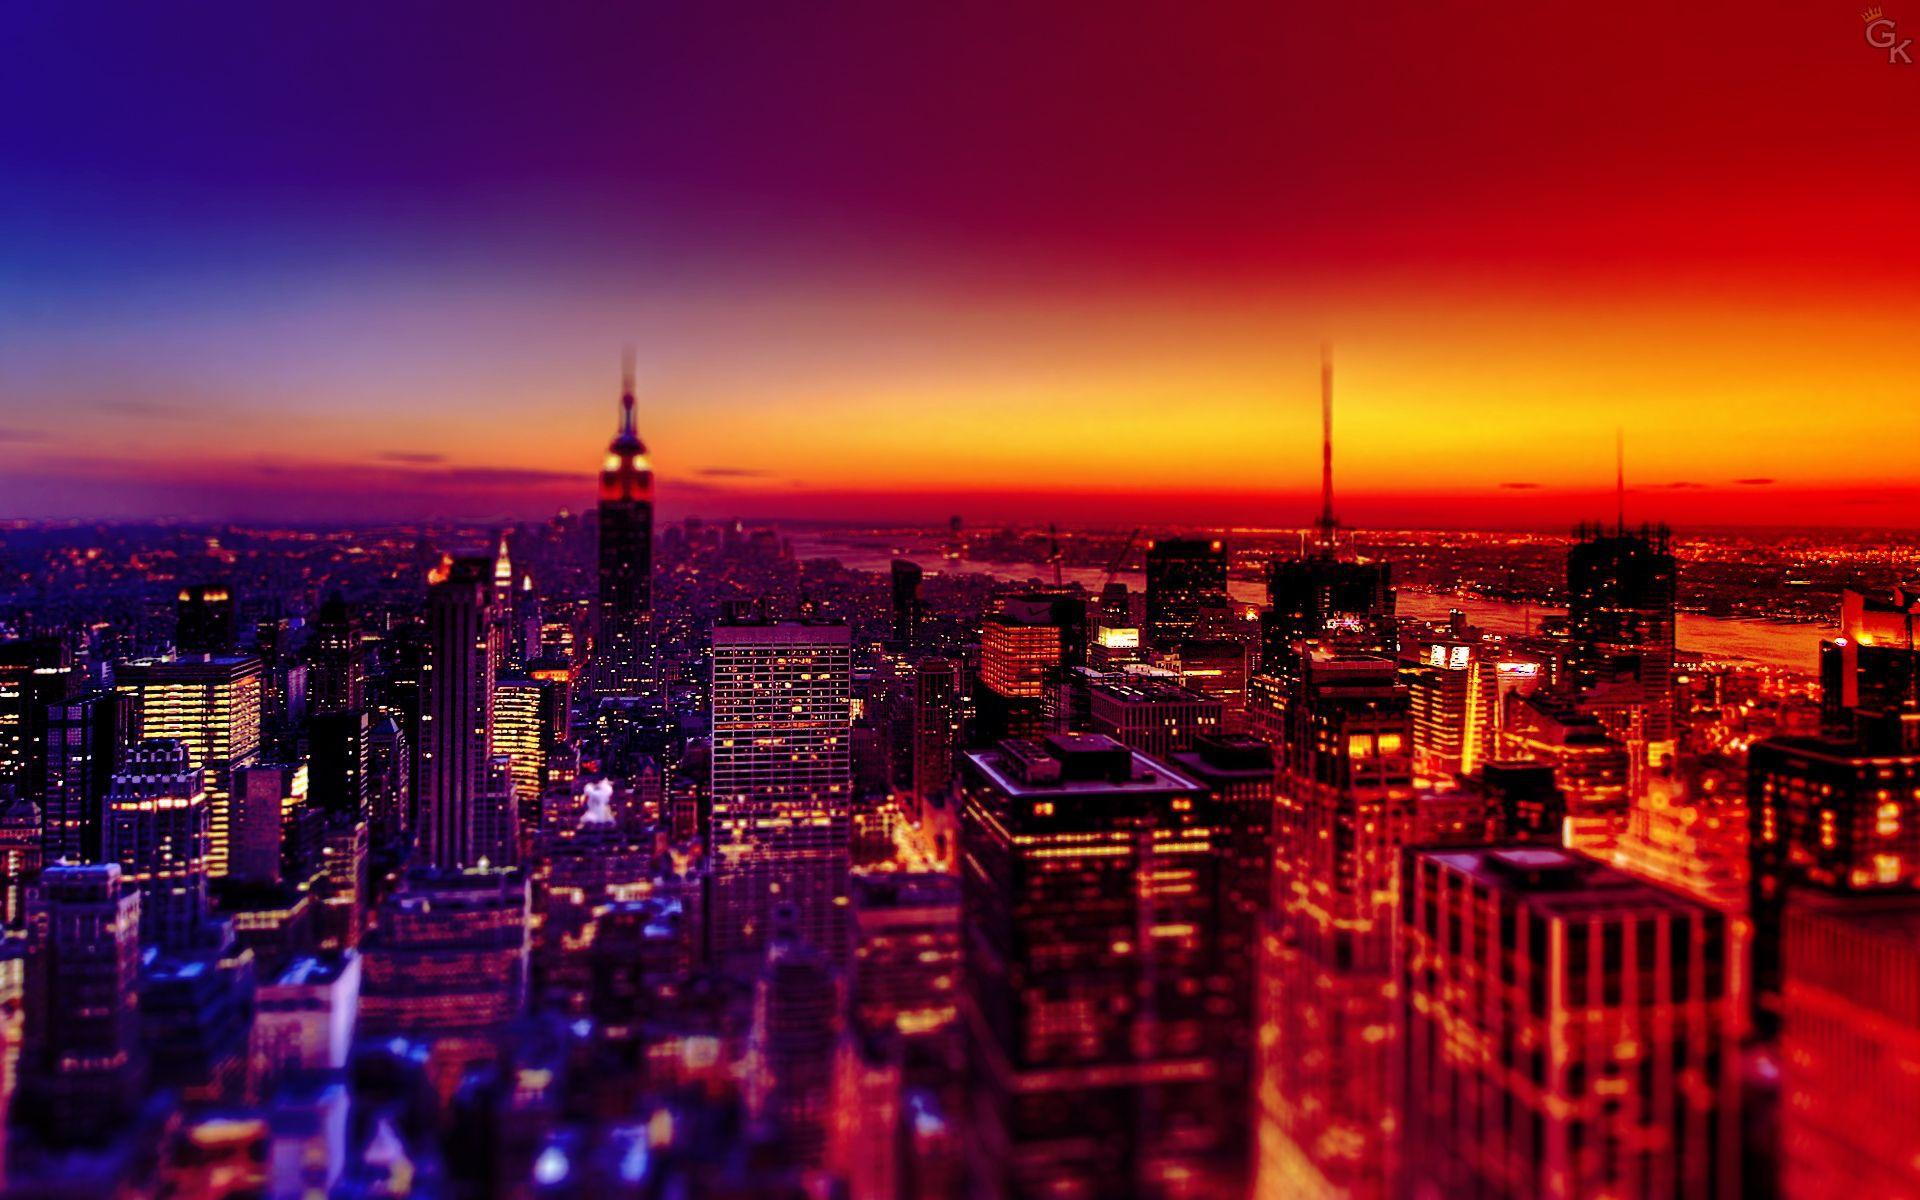 Best Photo City Wallpaper Night Landscape Landscape Wallpaper